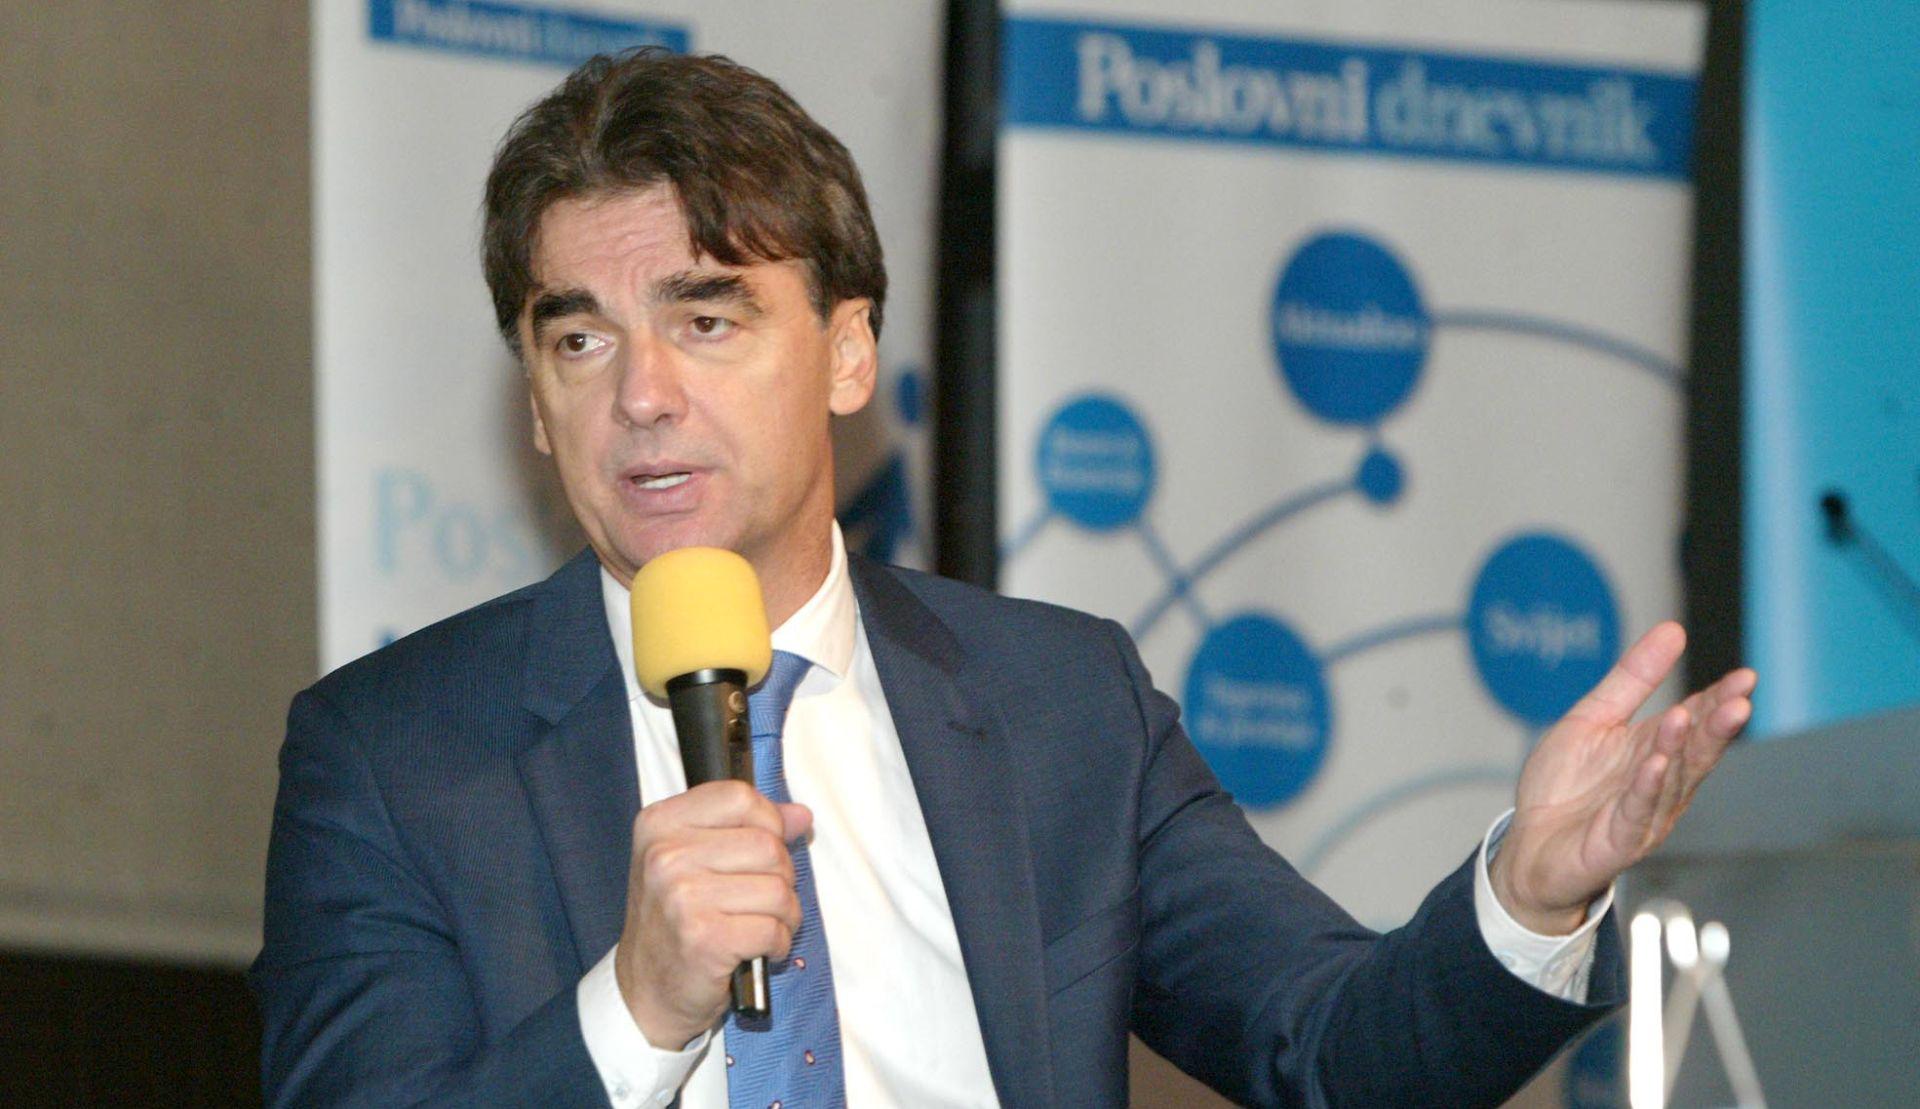 Grčić: Pravi rezultati vidljivi u idućem mandatu